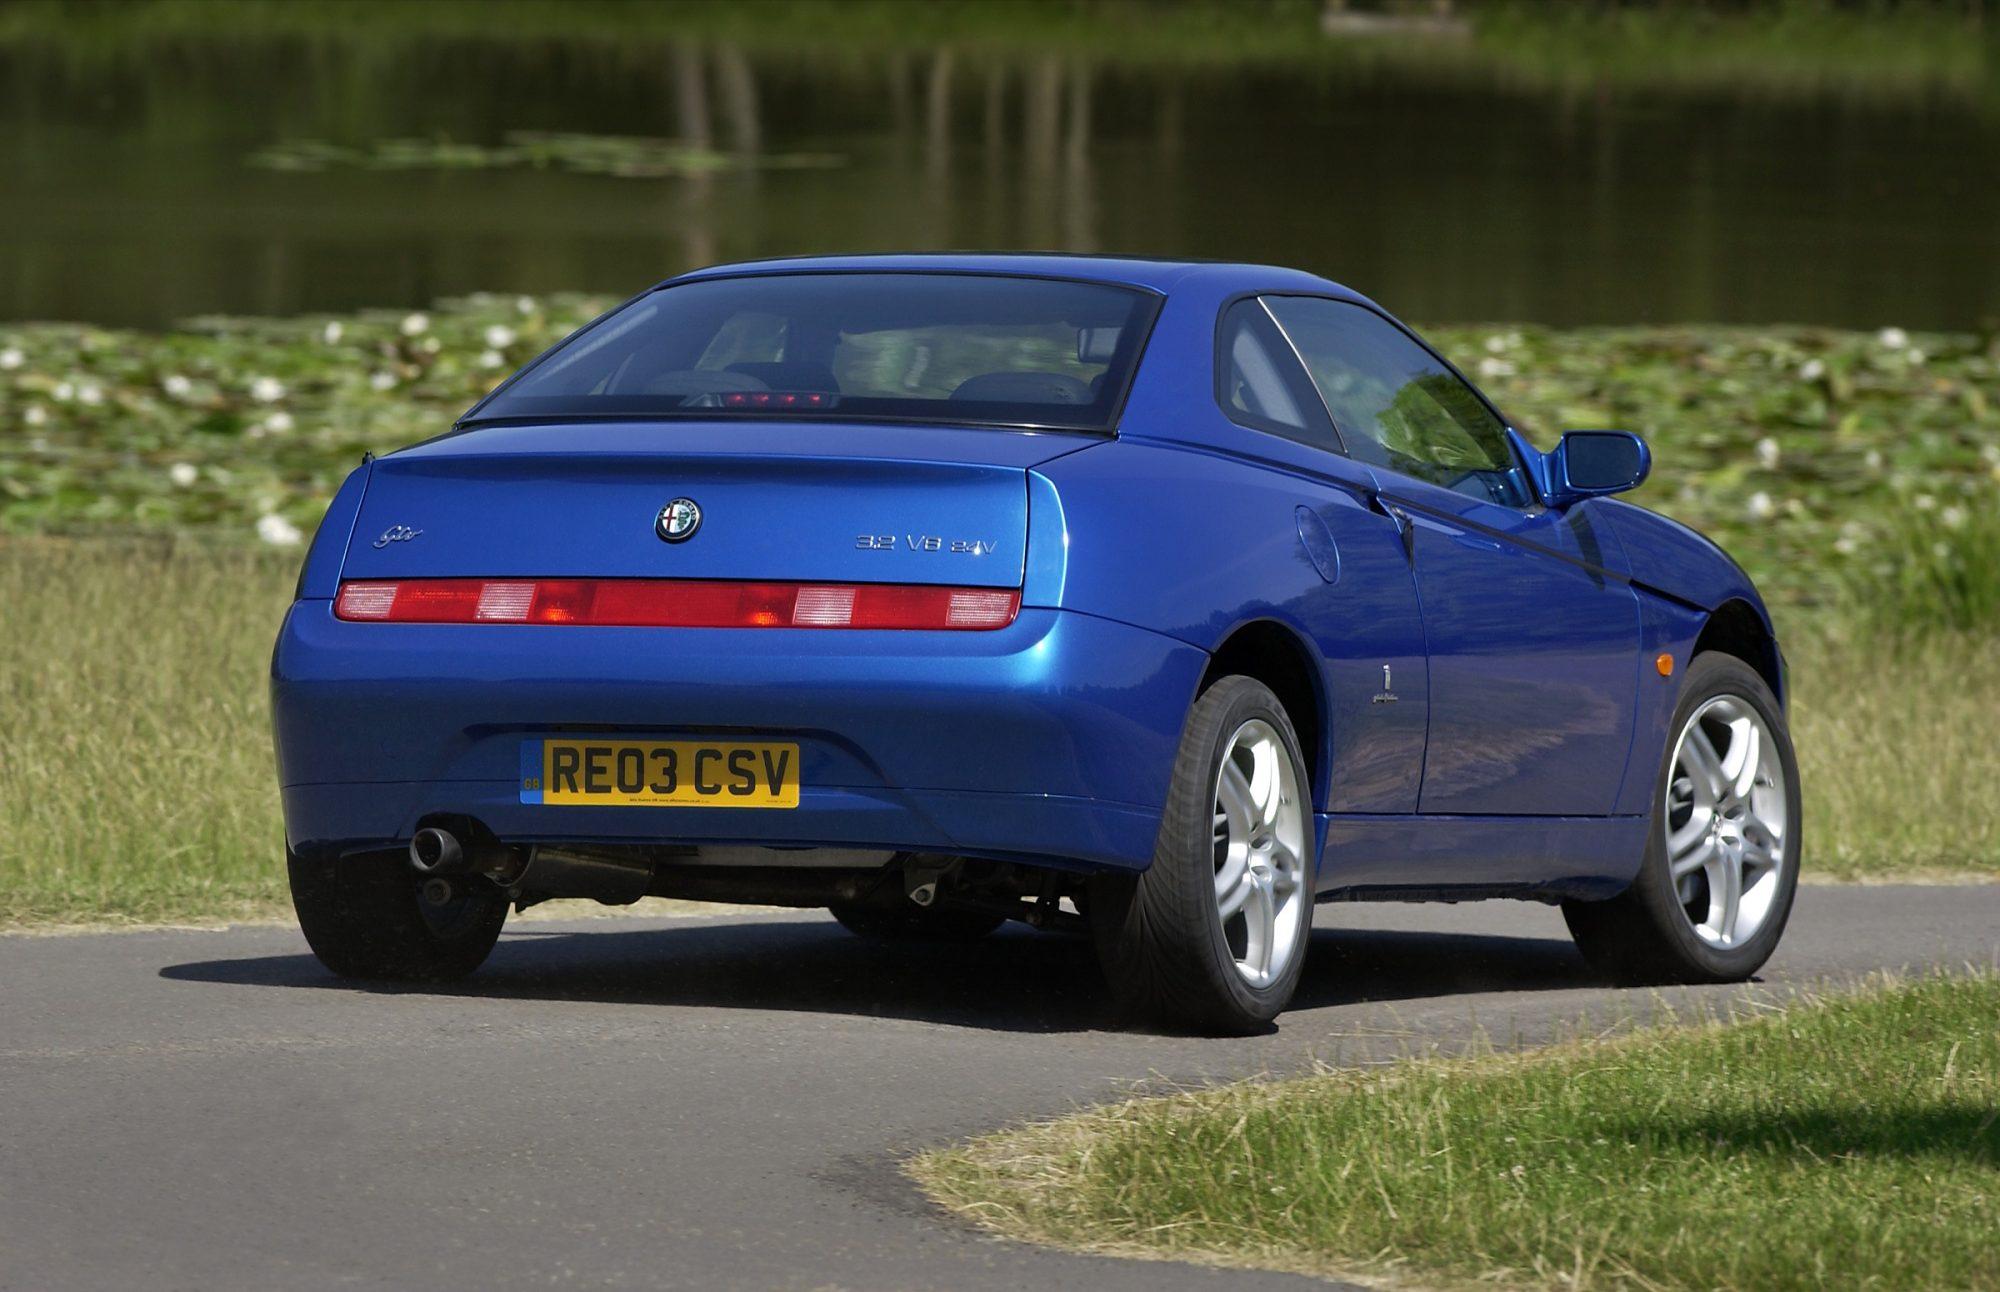 Alfa, Alfa Romeo, Alfa Romeo GTV, Alfa Romeo Spider, GTV, Spider, GTV blue